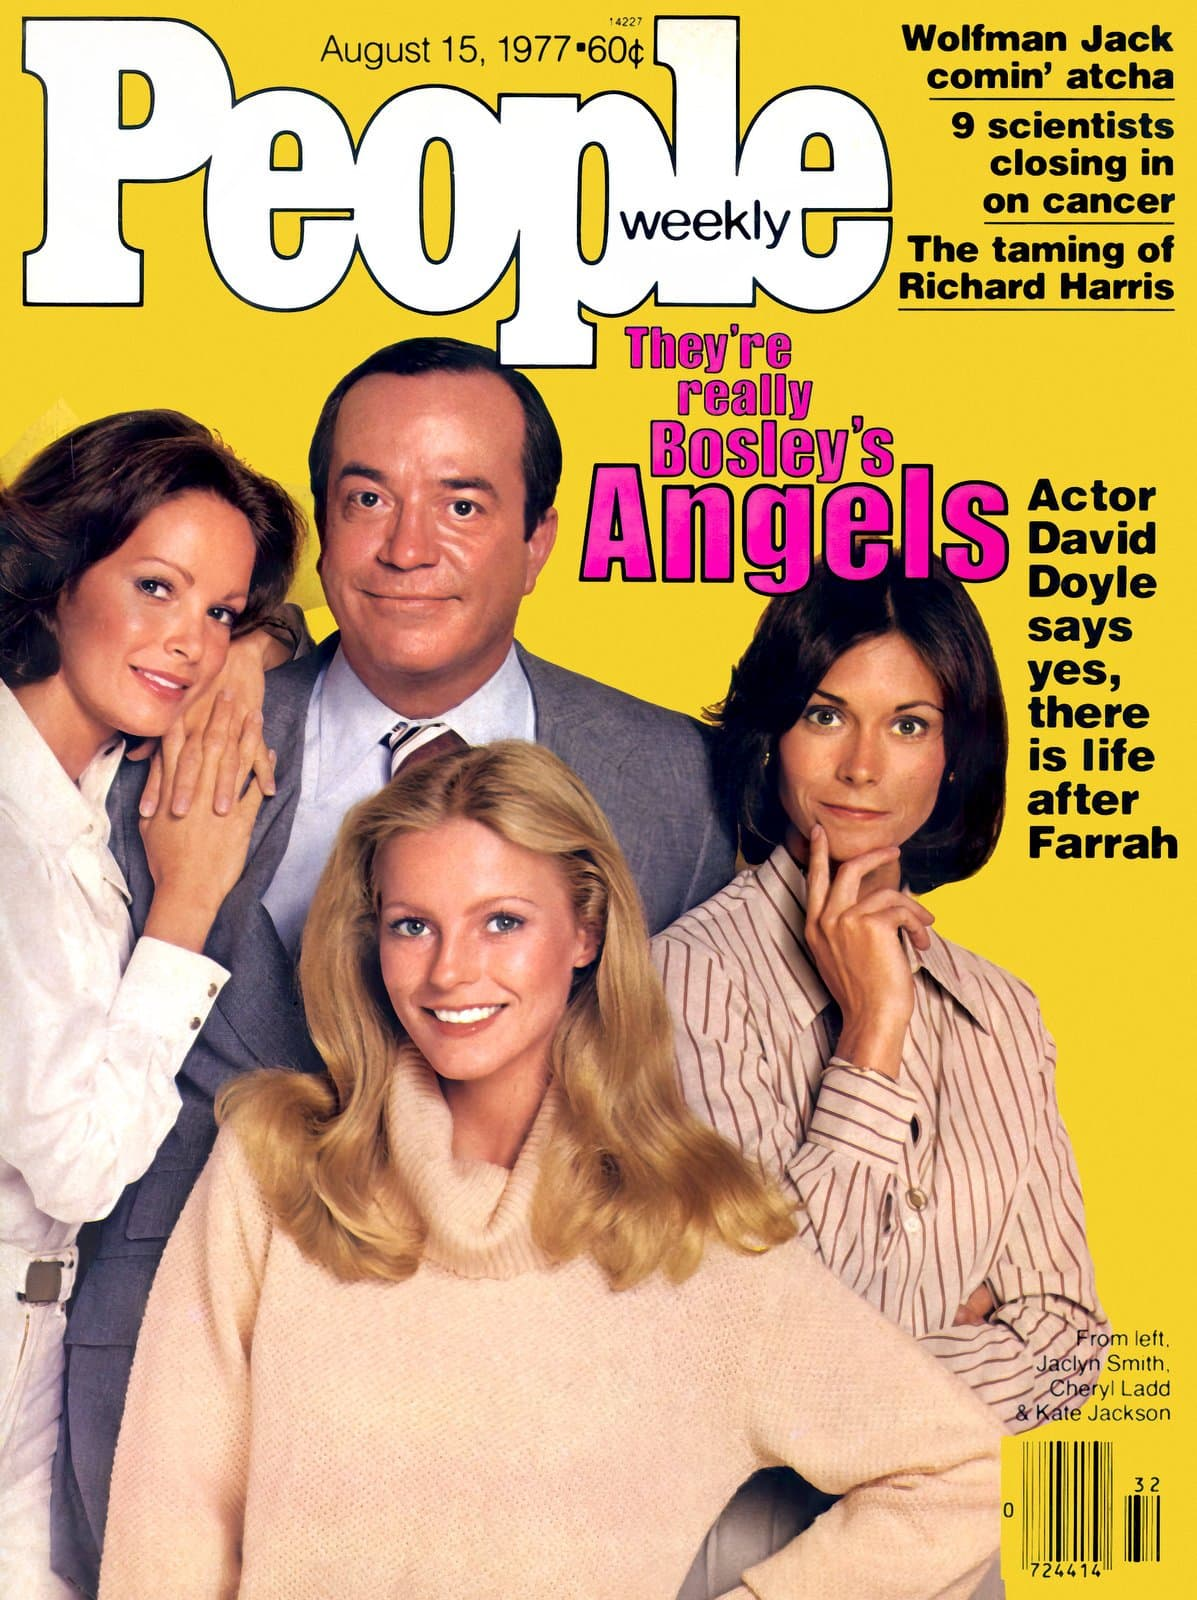 Vintage 70s Charlie's Angels cast - People magazine (1977)